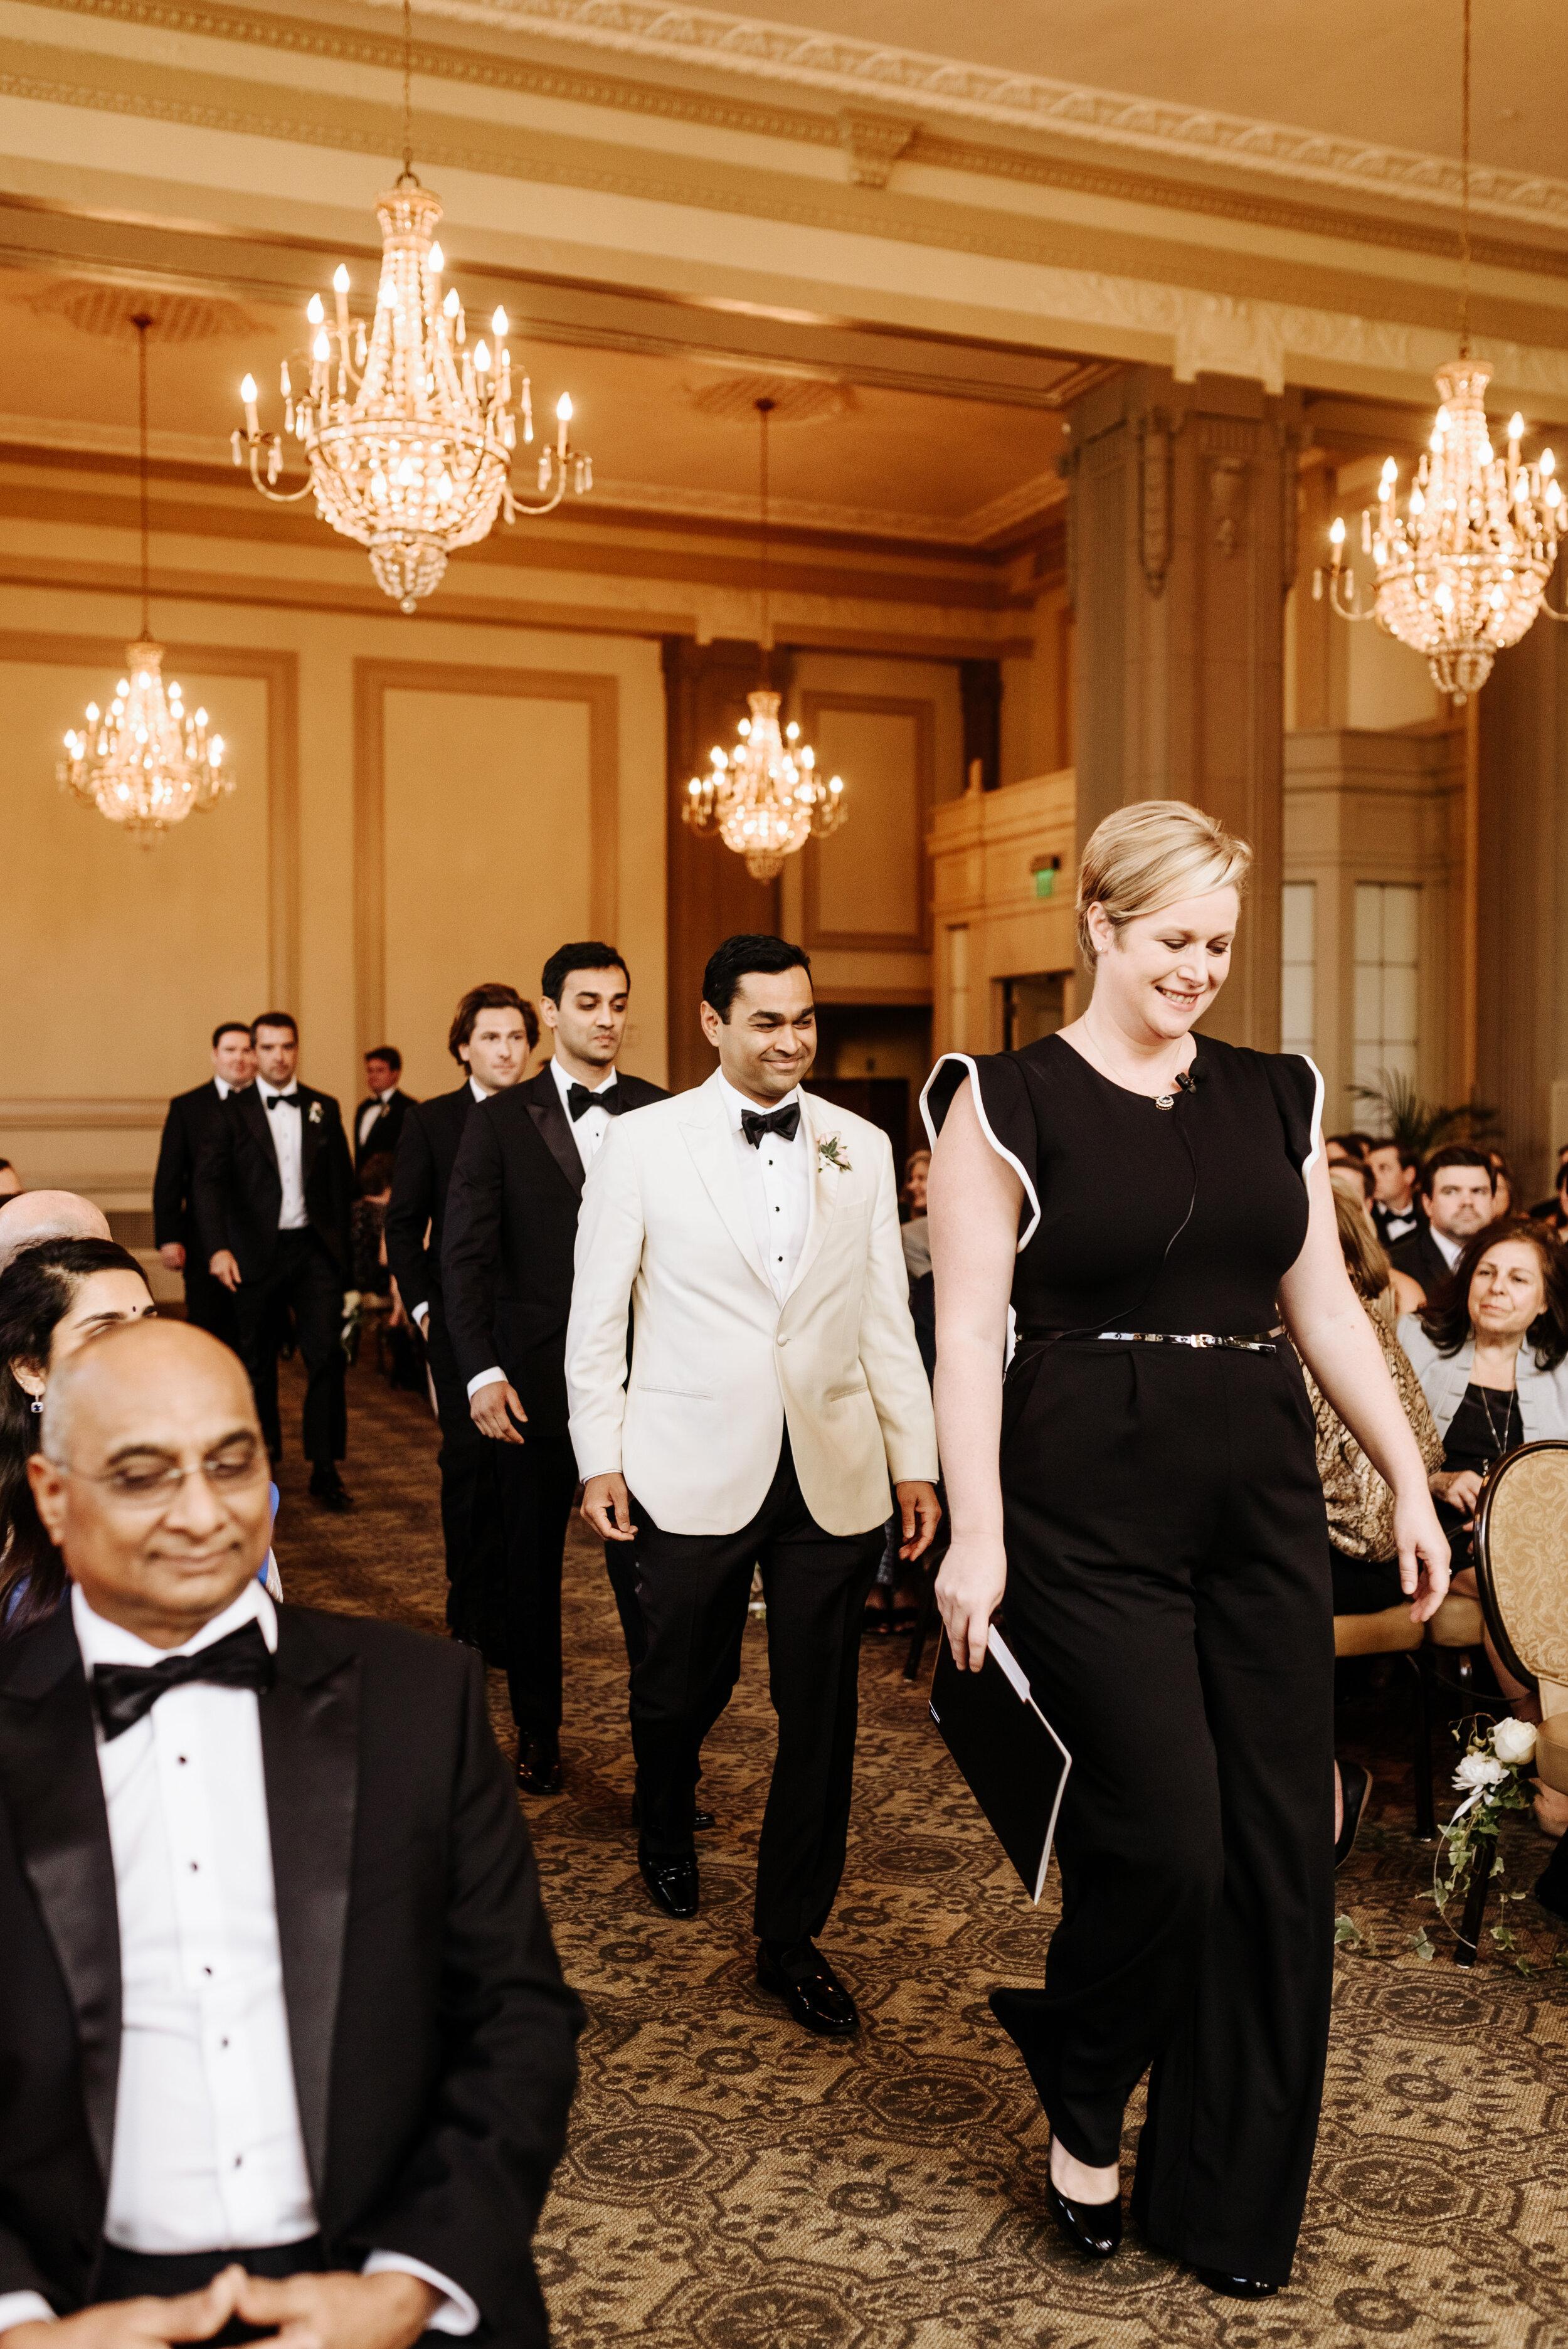 Cassie-Mrunal-Wedding-Quirk-Hotel-John-Marshall-Ballrooms-Richmond-Virginia-Photography-by-V-67.jpg